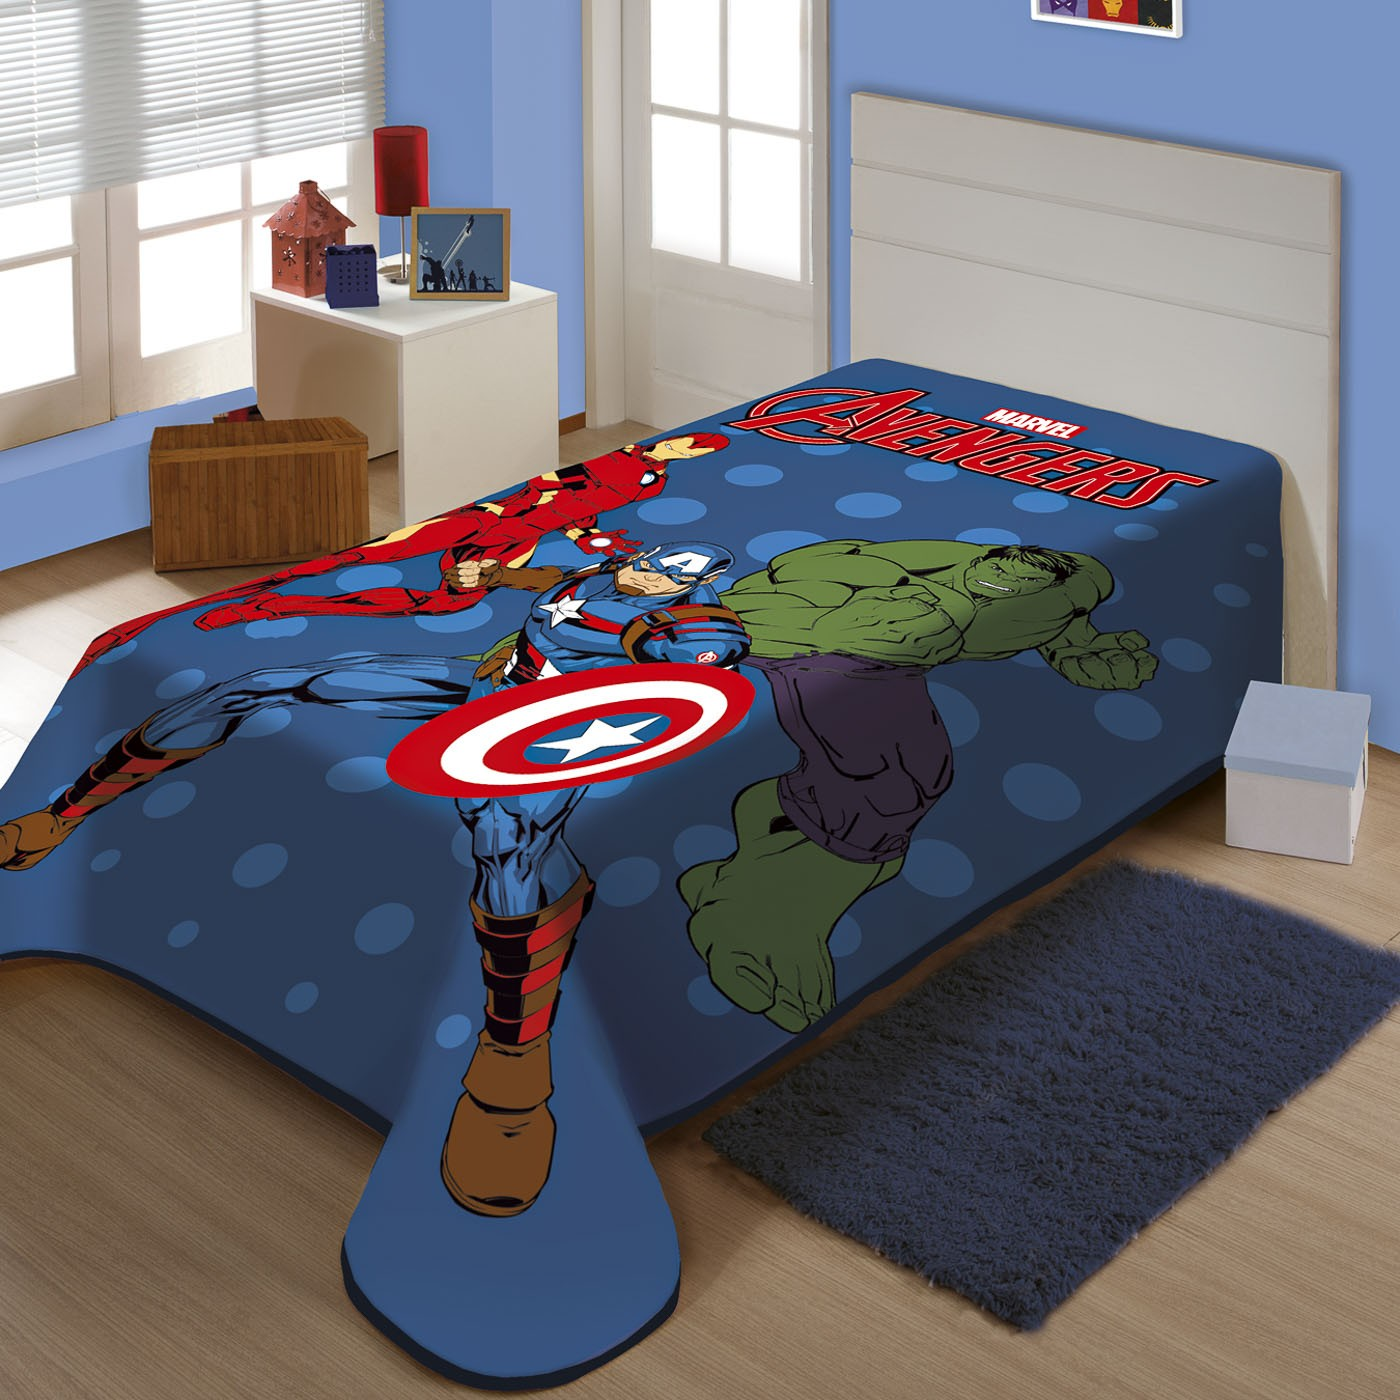 Cobertor Juvenil Raschel Plus Marvel Avengers Em Ação Jolitex